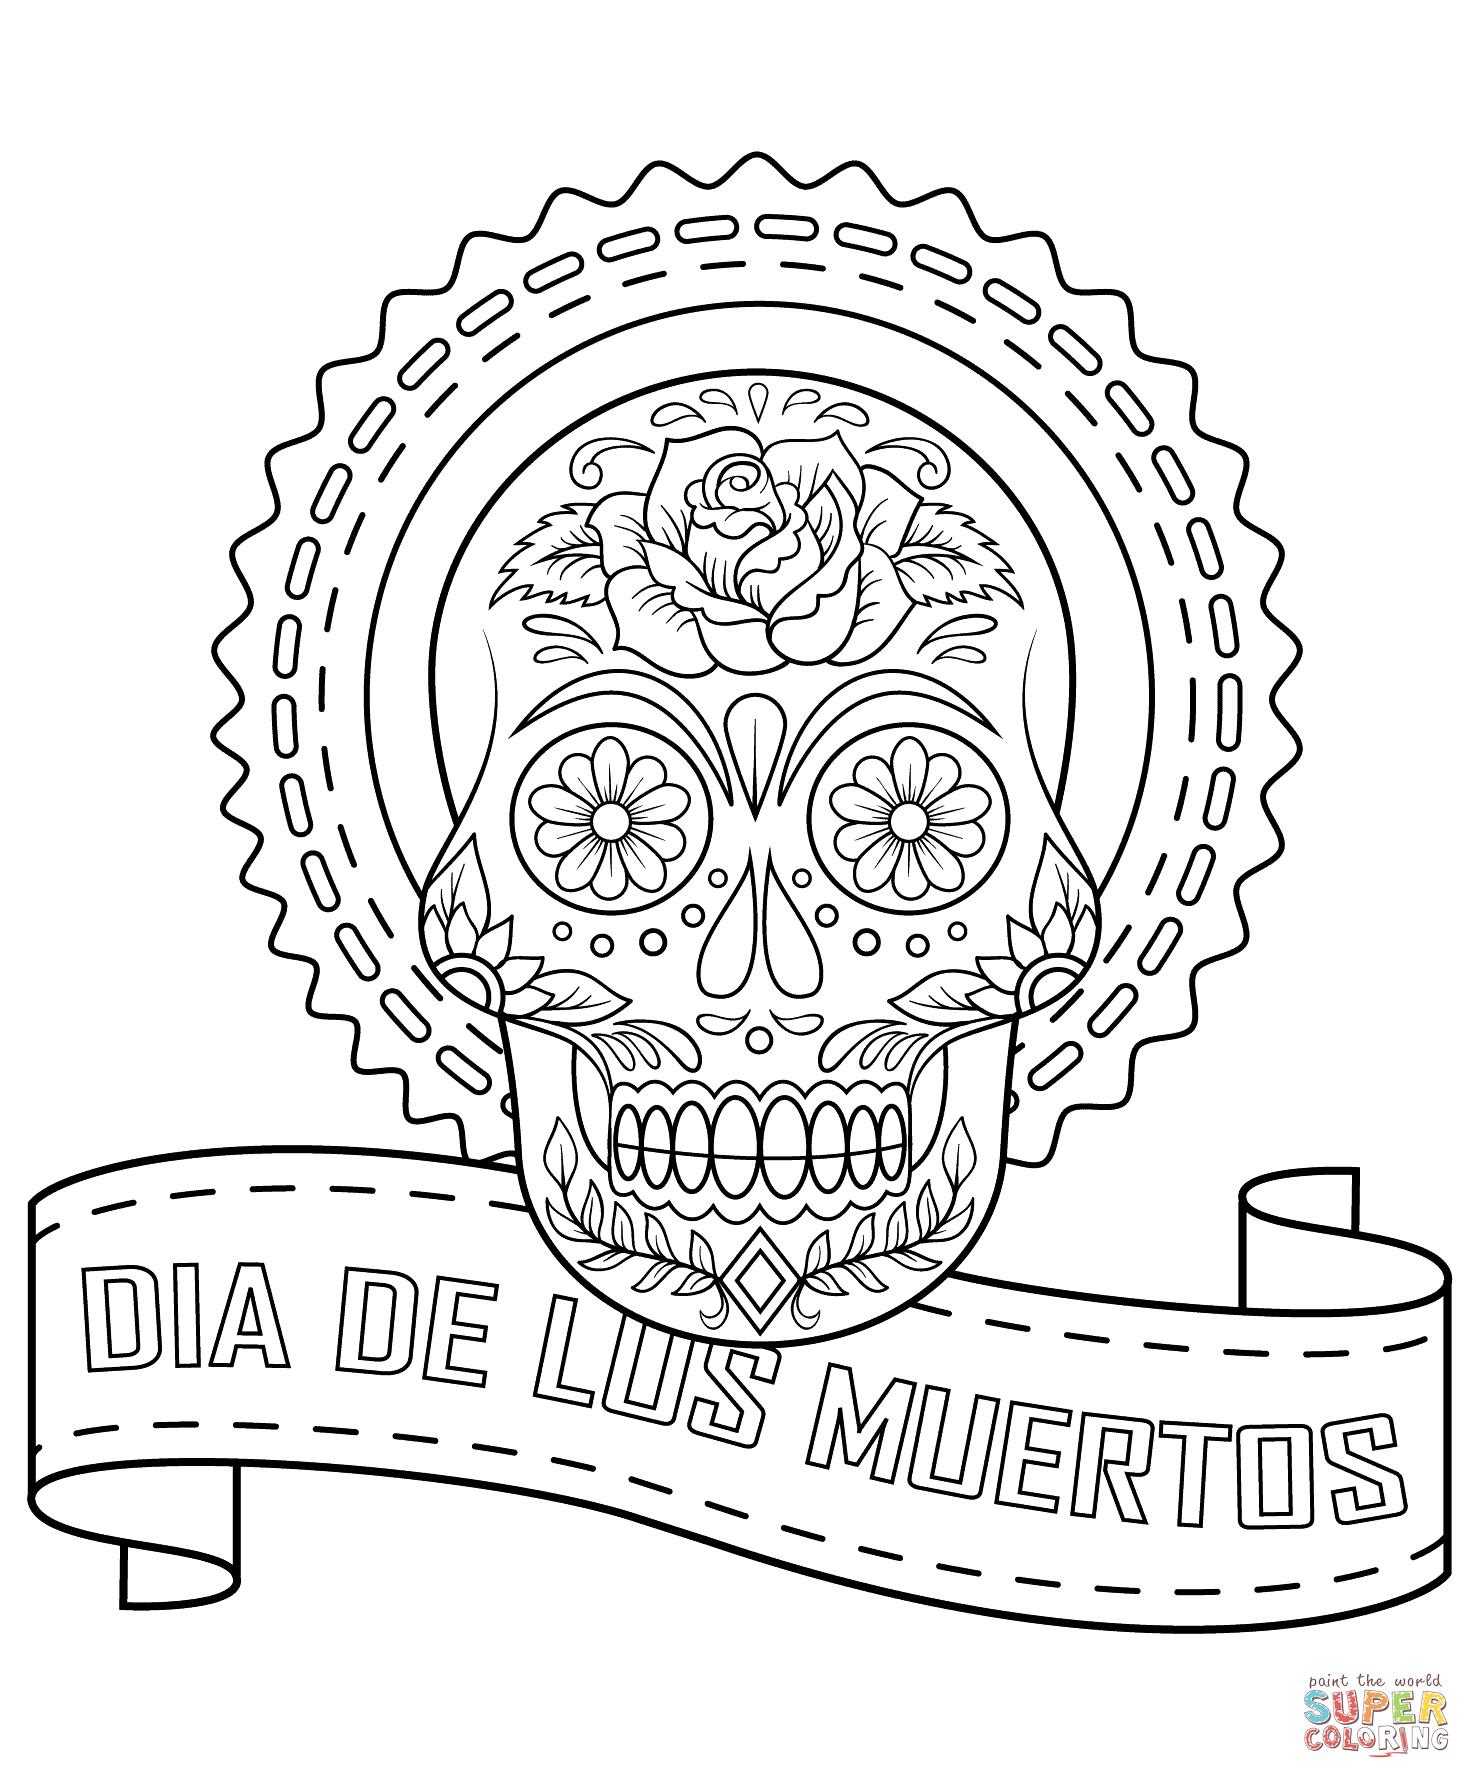 Coloriage gratuit Día de los Muertos aux traits fins